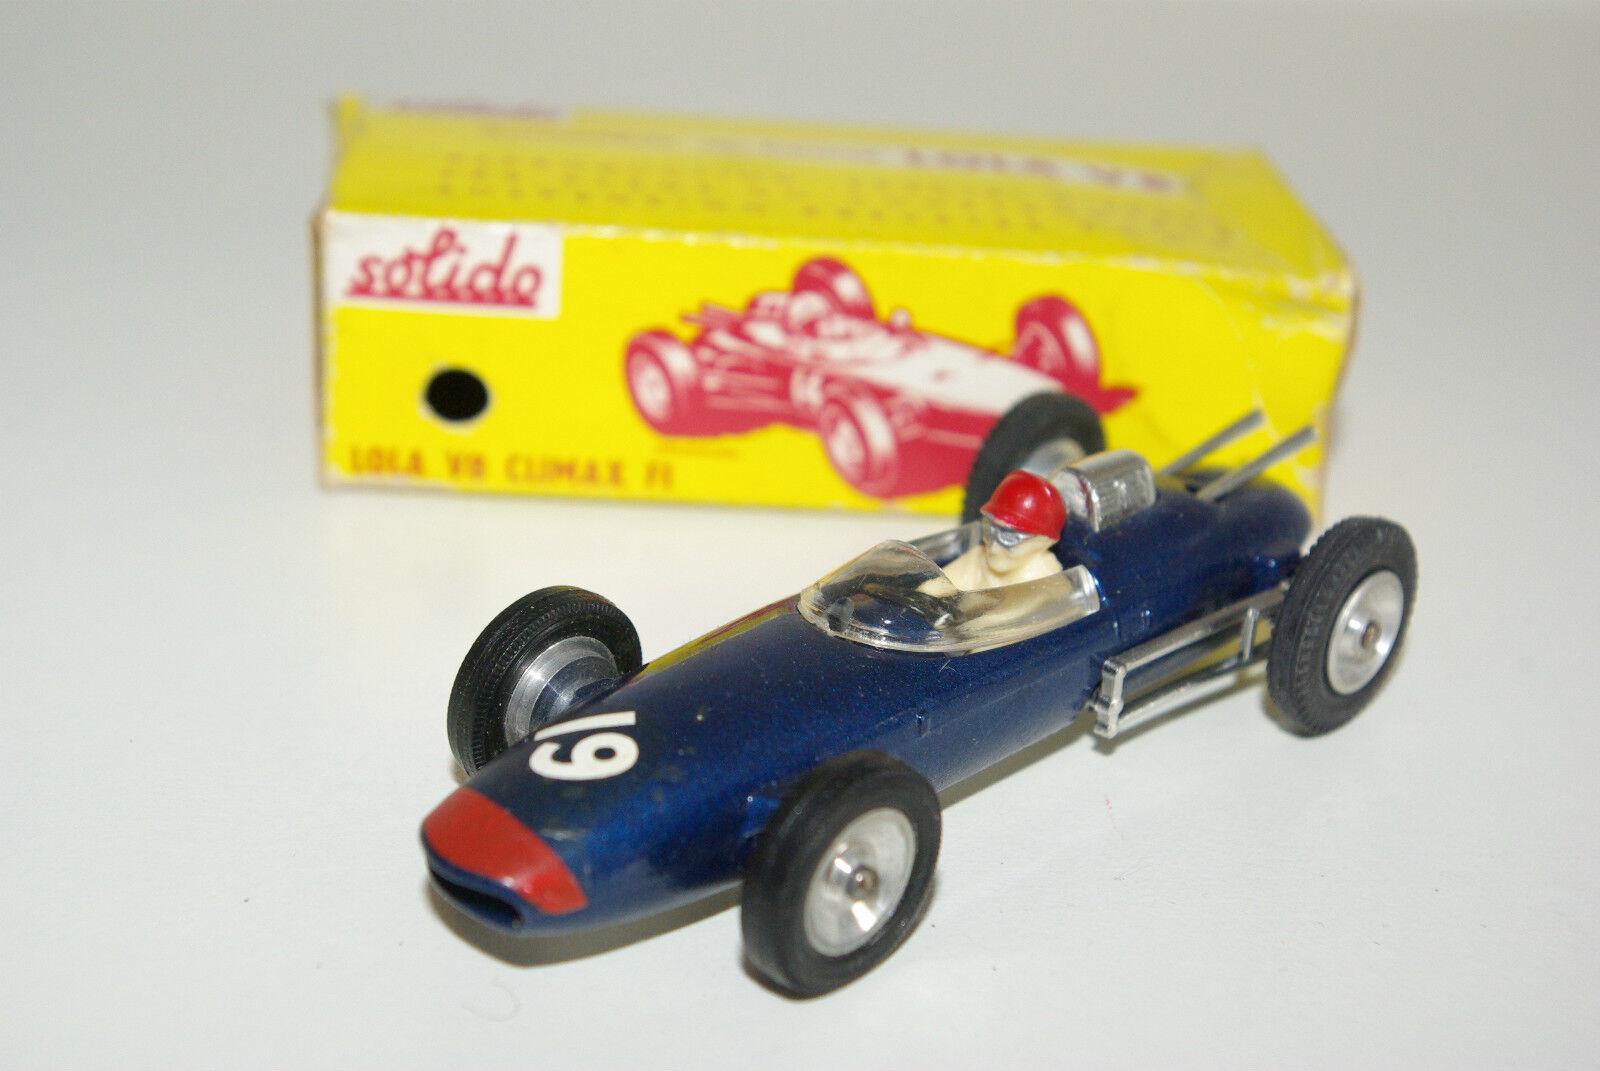 SOLIDO Série 100 135 Lola v8 Climax f1 F 1 FORMULA 1 RACING CAR VN Comme neuf en boîte